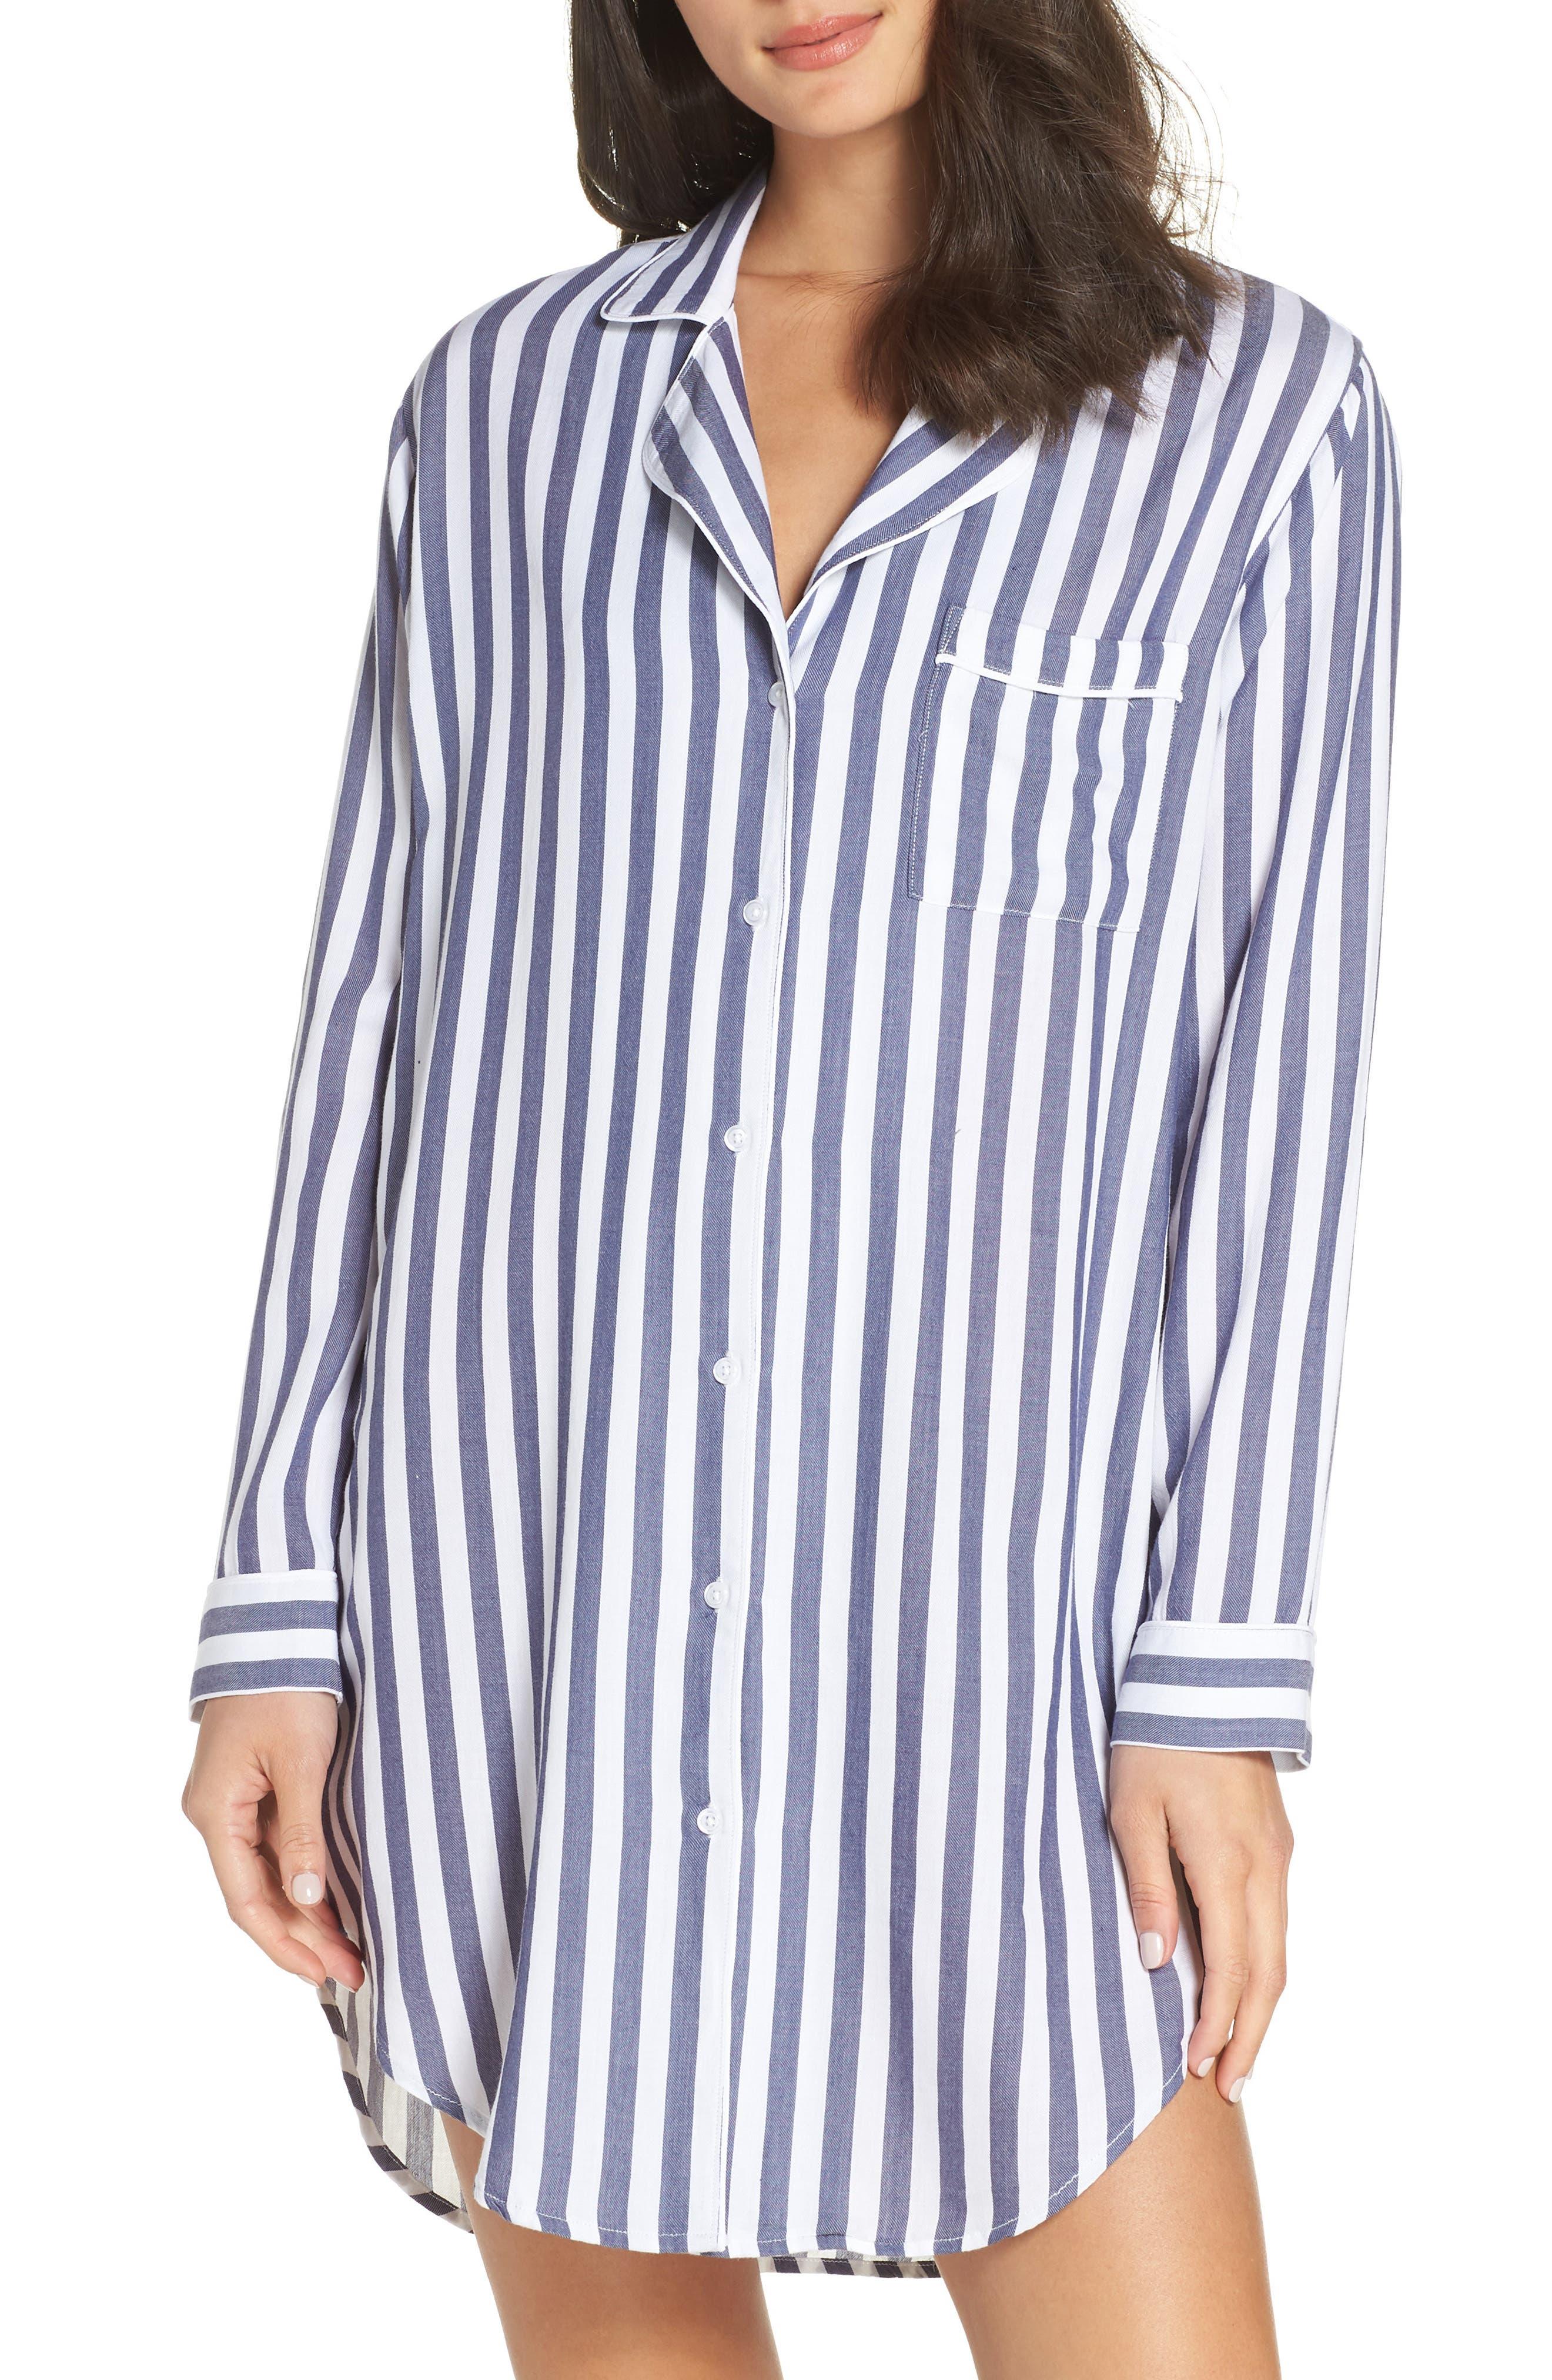 RAILS,                             Striped Sleep Shirt,                             Main thumbnail 1, color,                             434